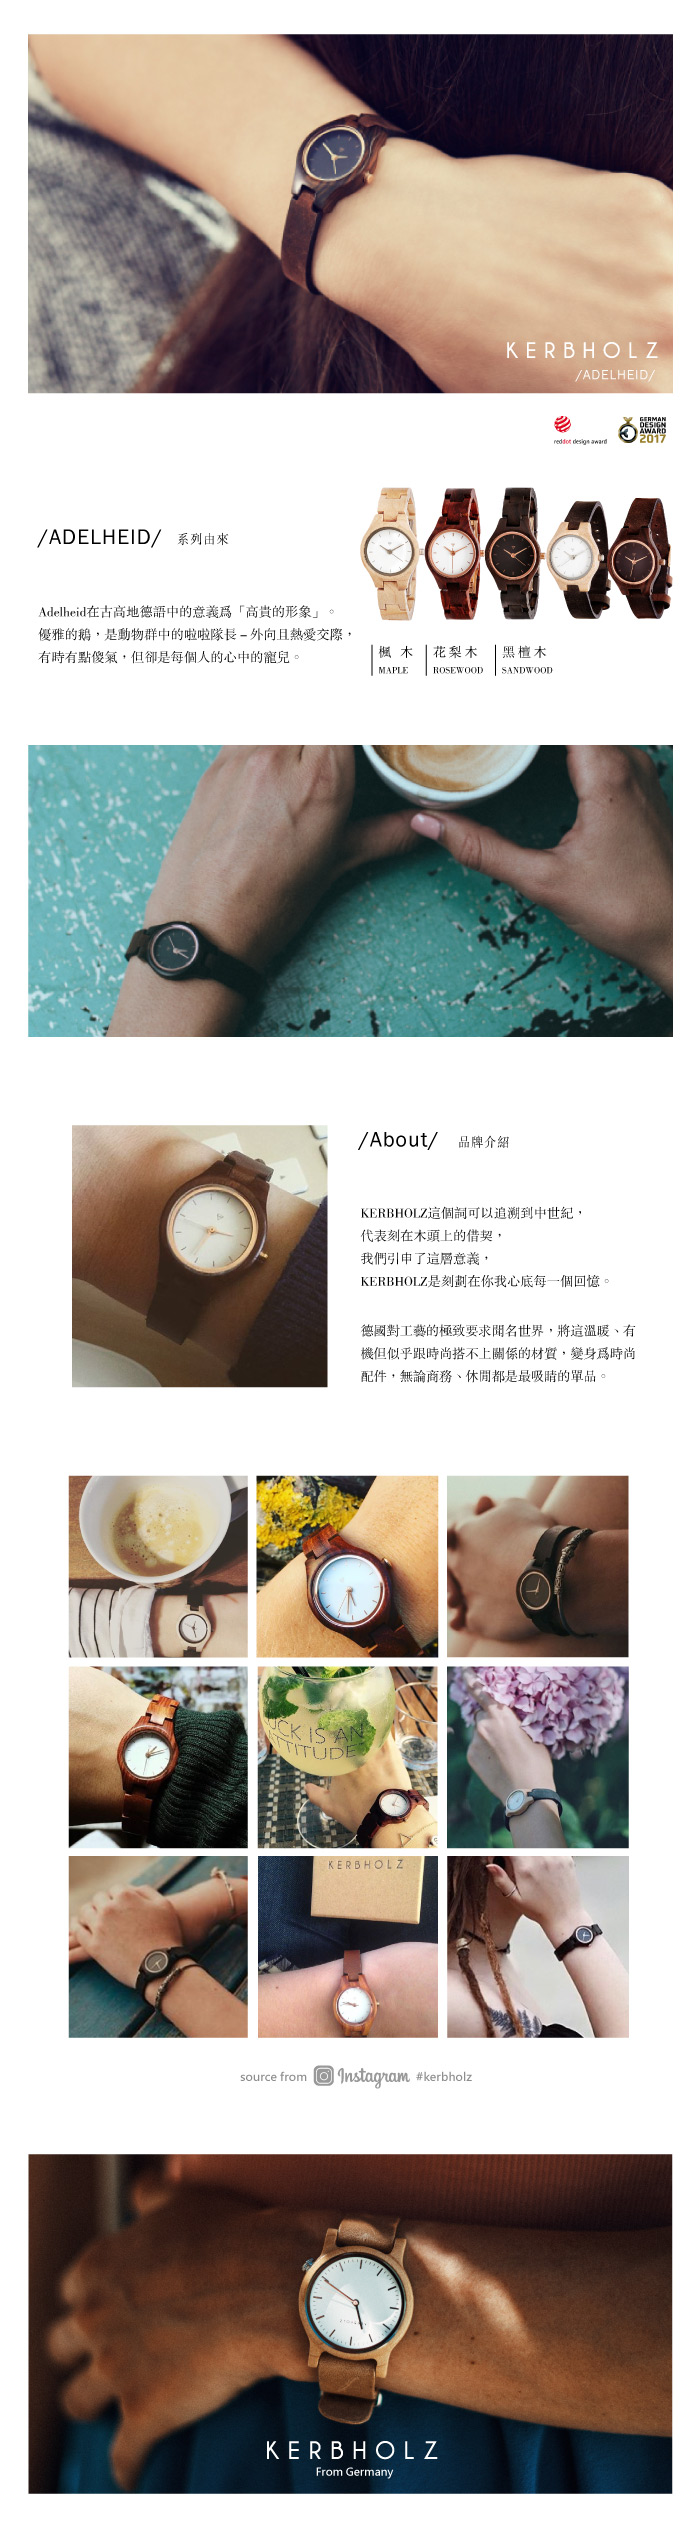 KERBHOLZ 原木手錶 Adelheid-楓木 (真皮錶帶)